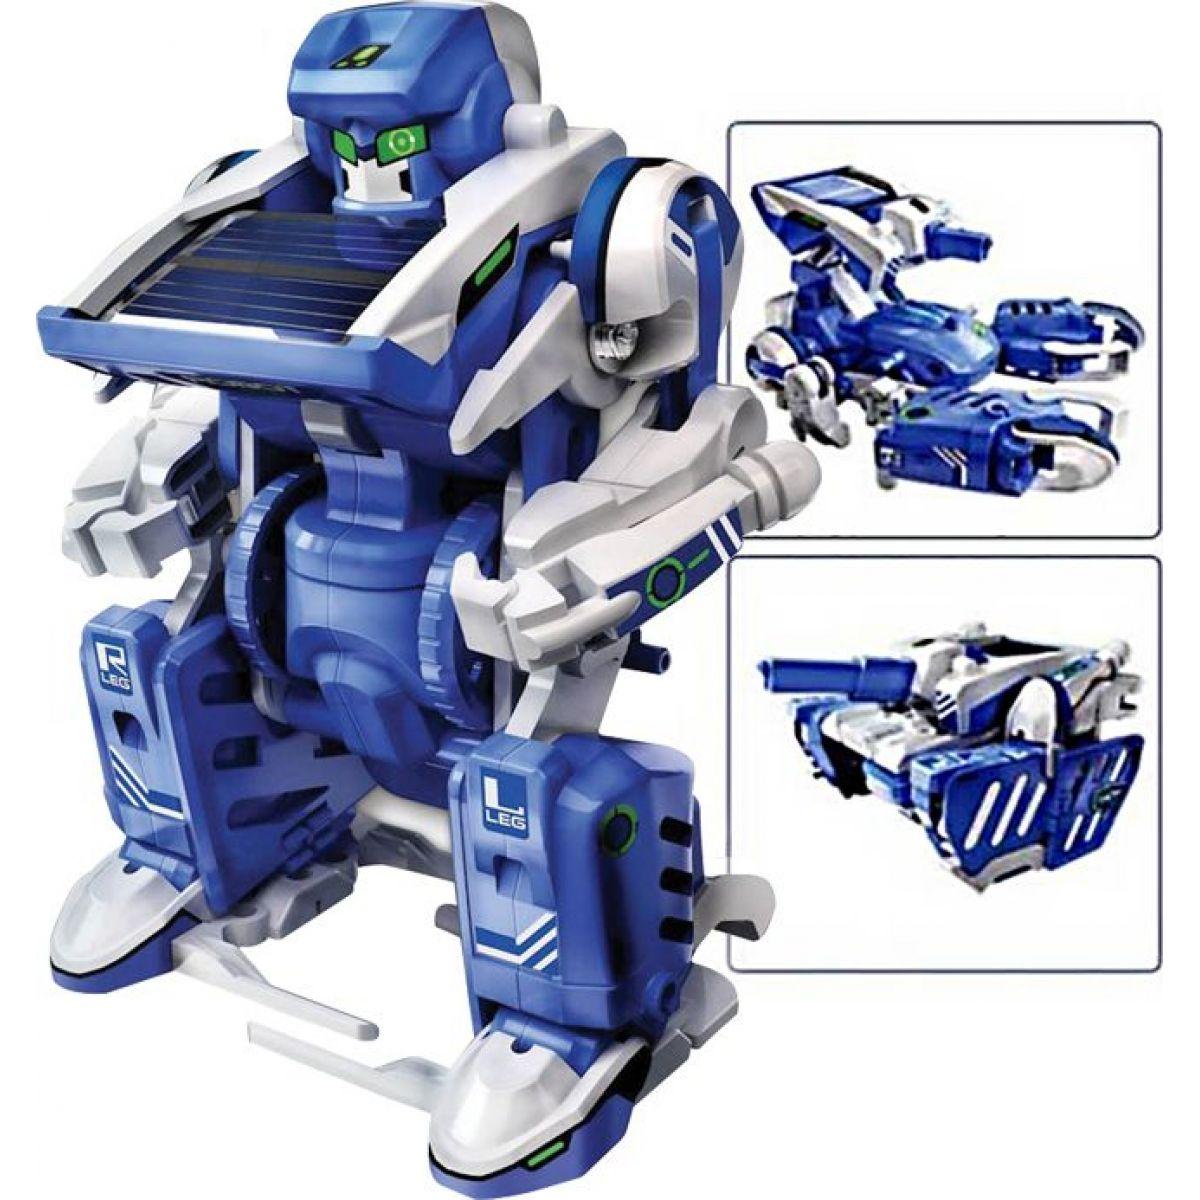 T3 Robot na solárny pohon